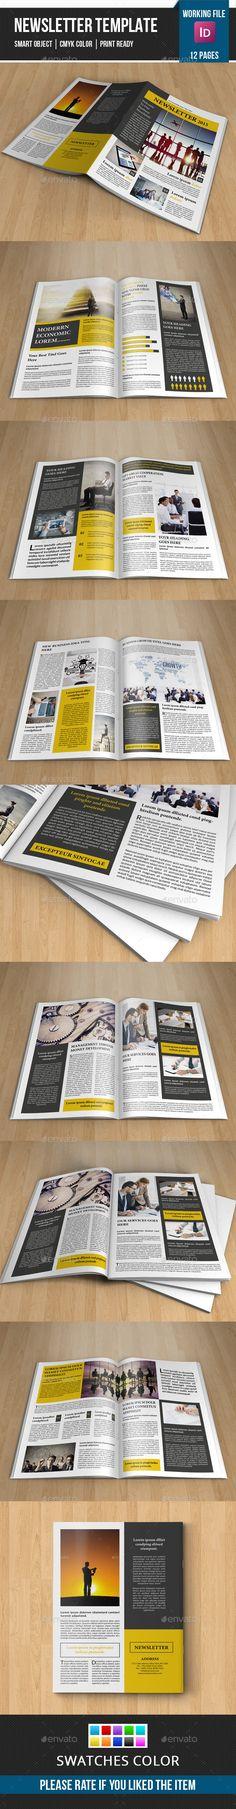 Corporate Newsletter-V06 - Newsletters Print Templates